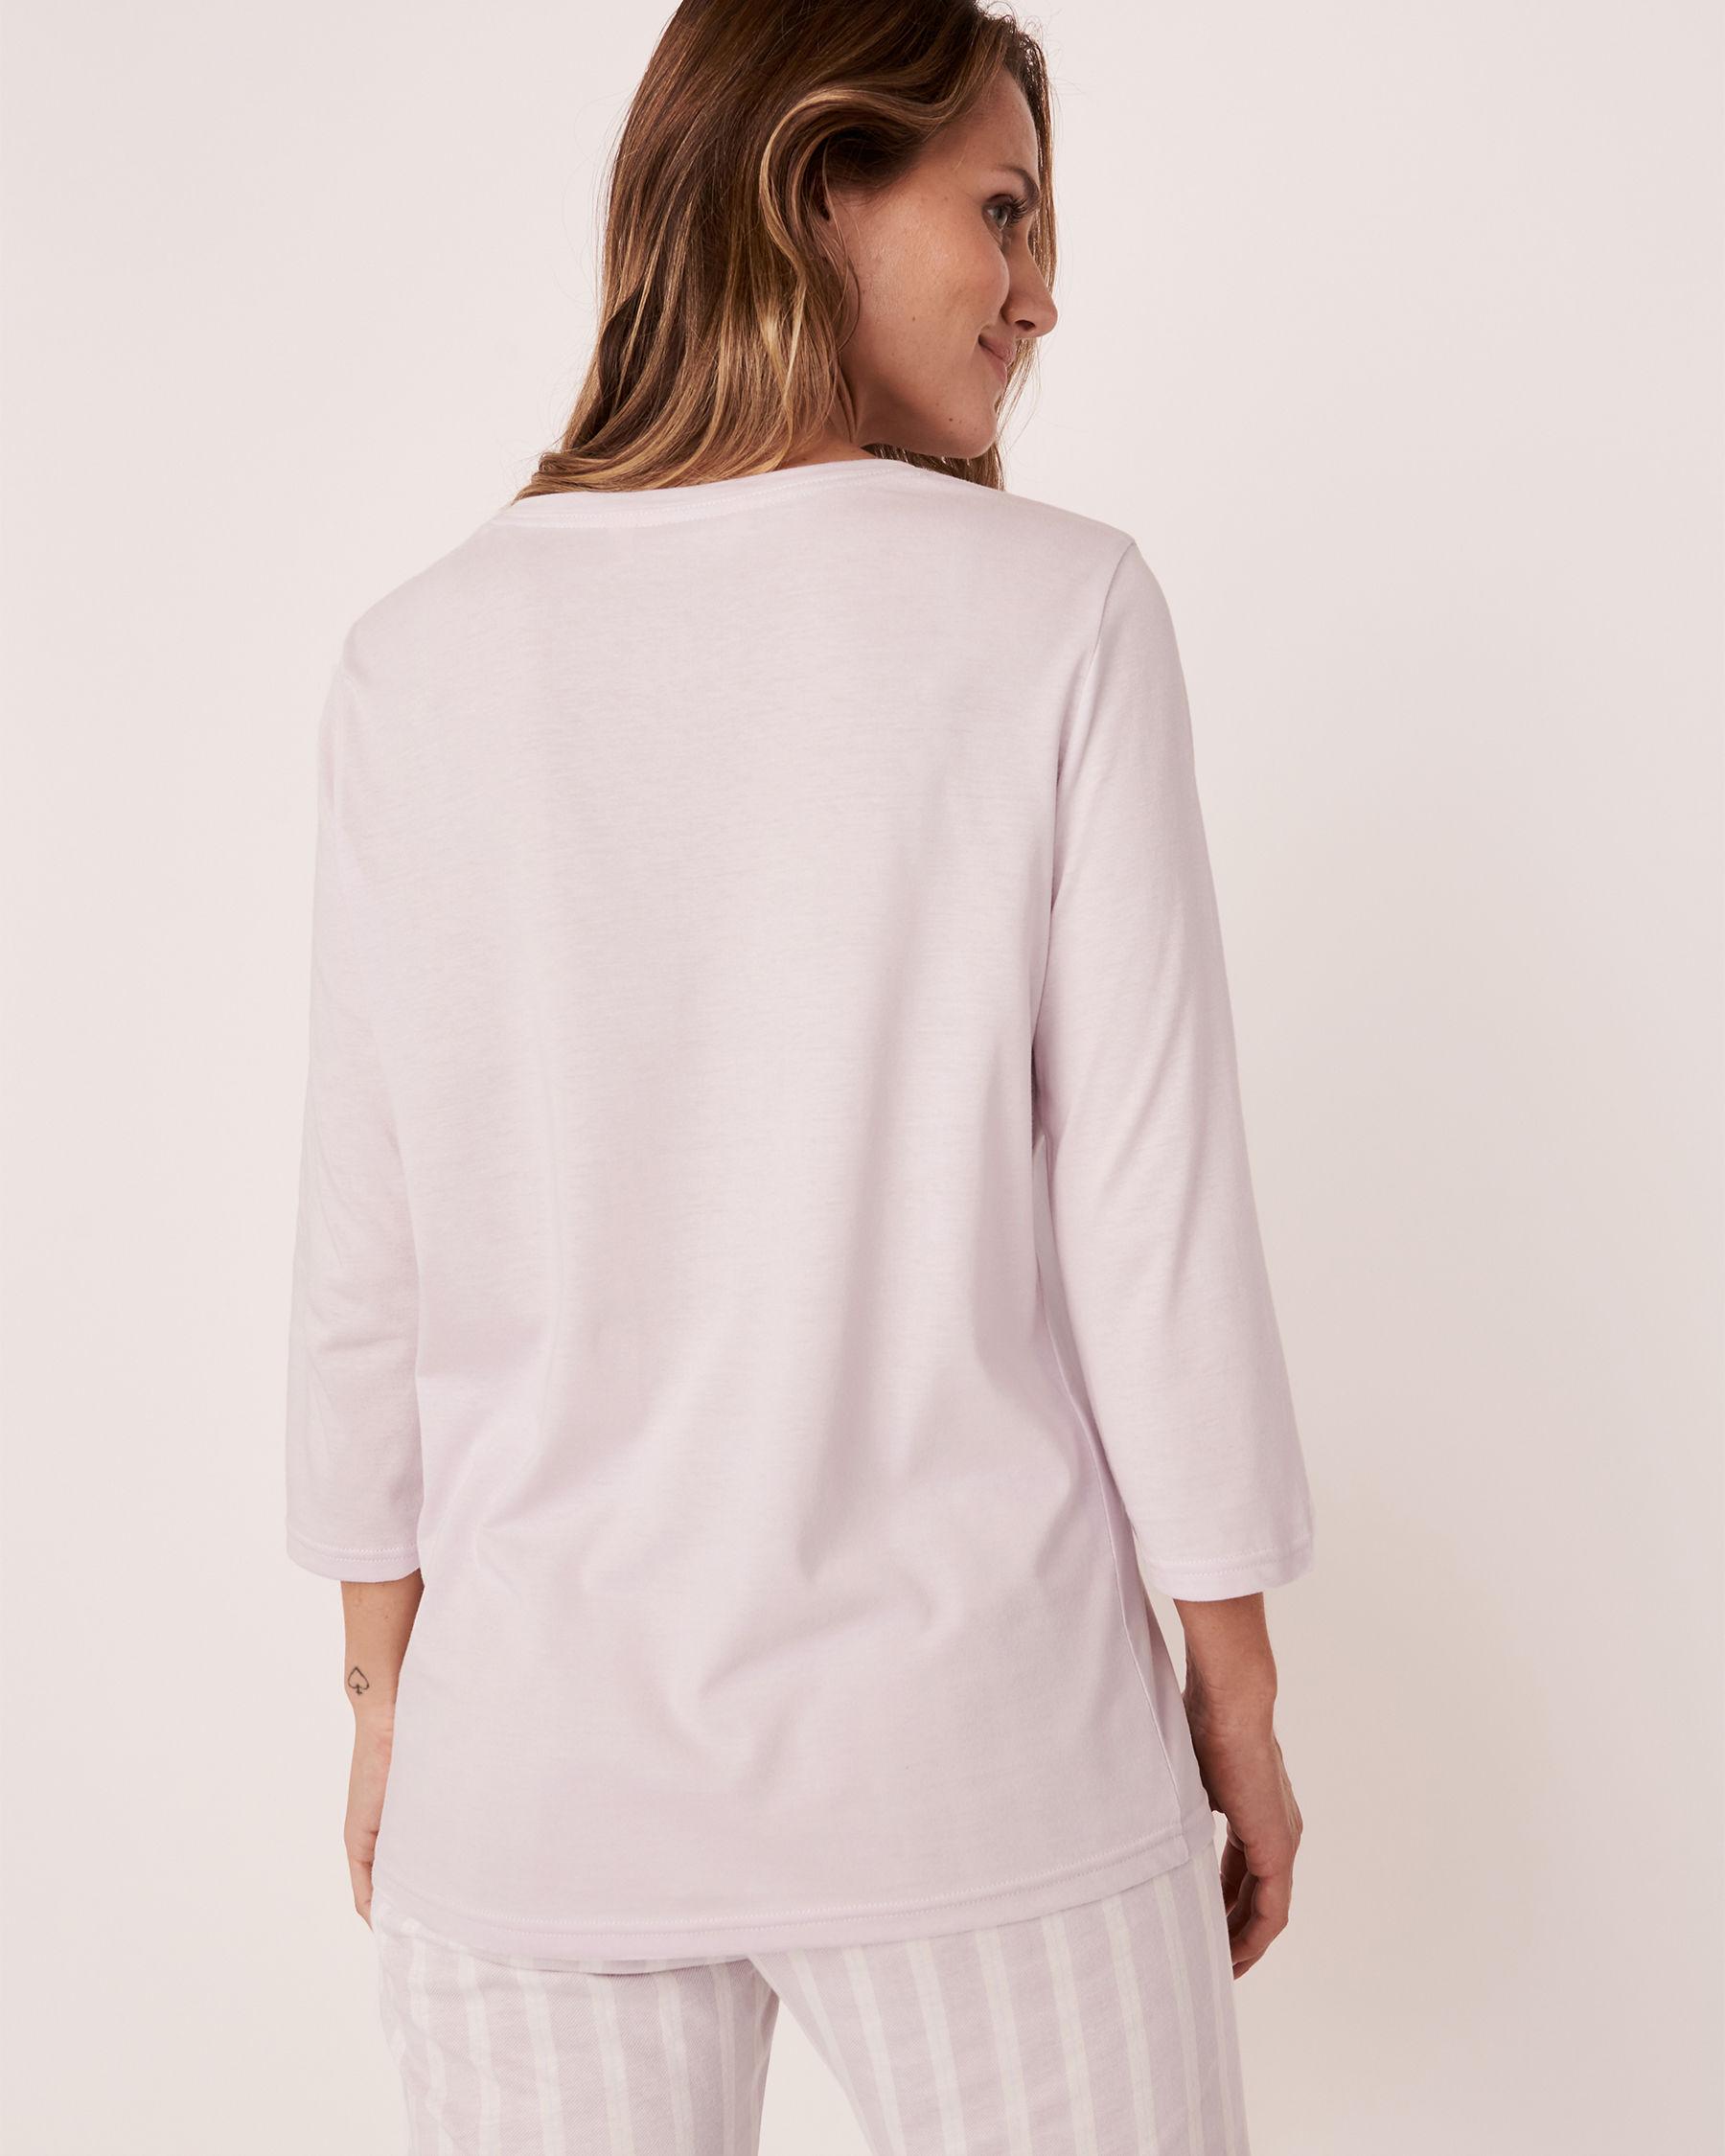 LA VIE EN ROSE V-neckline 3/4 Sleeve Shirt Lavender 40100168 - View3